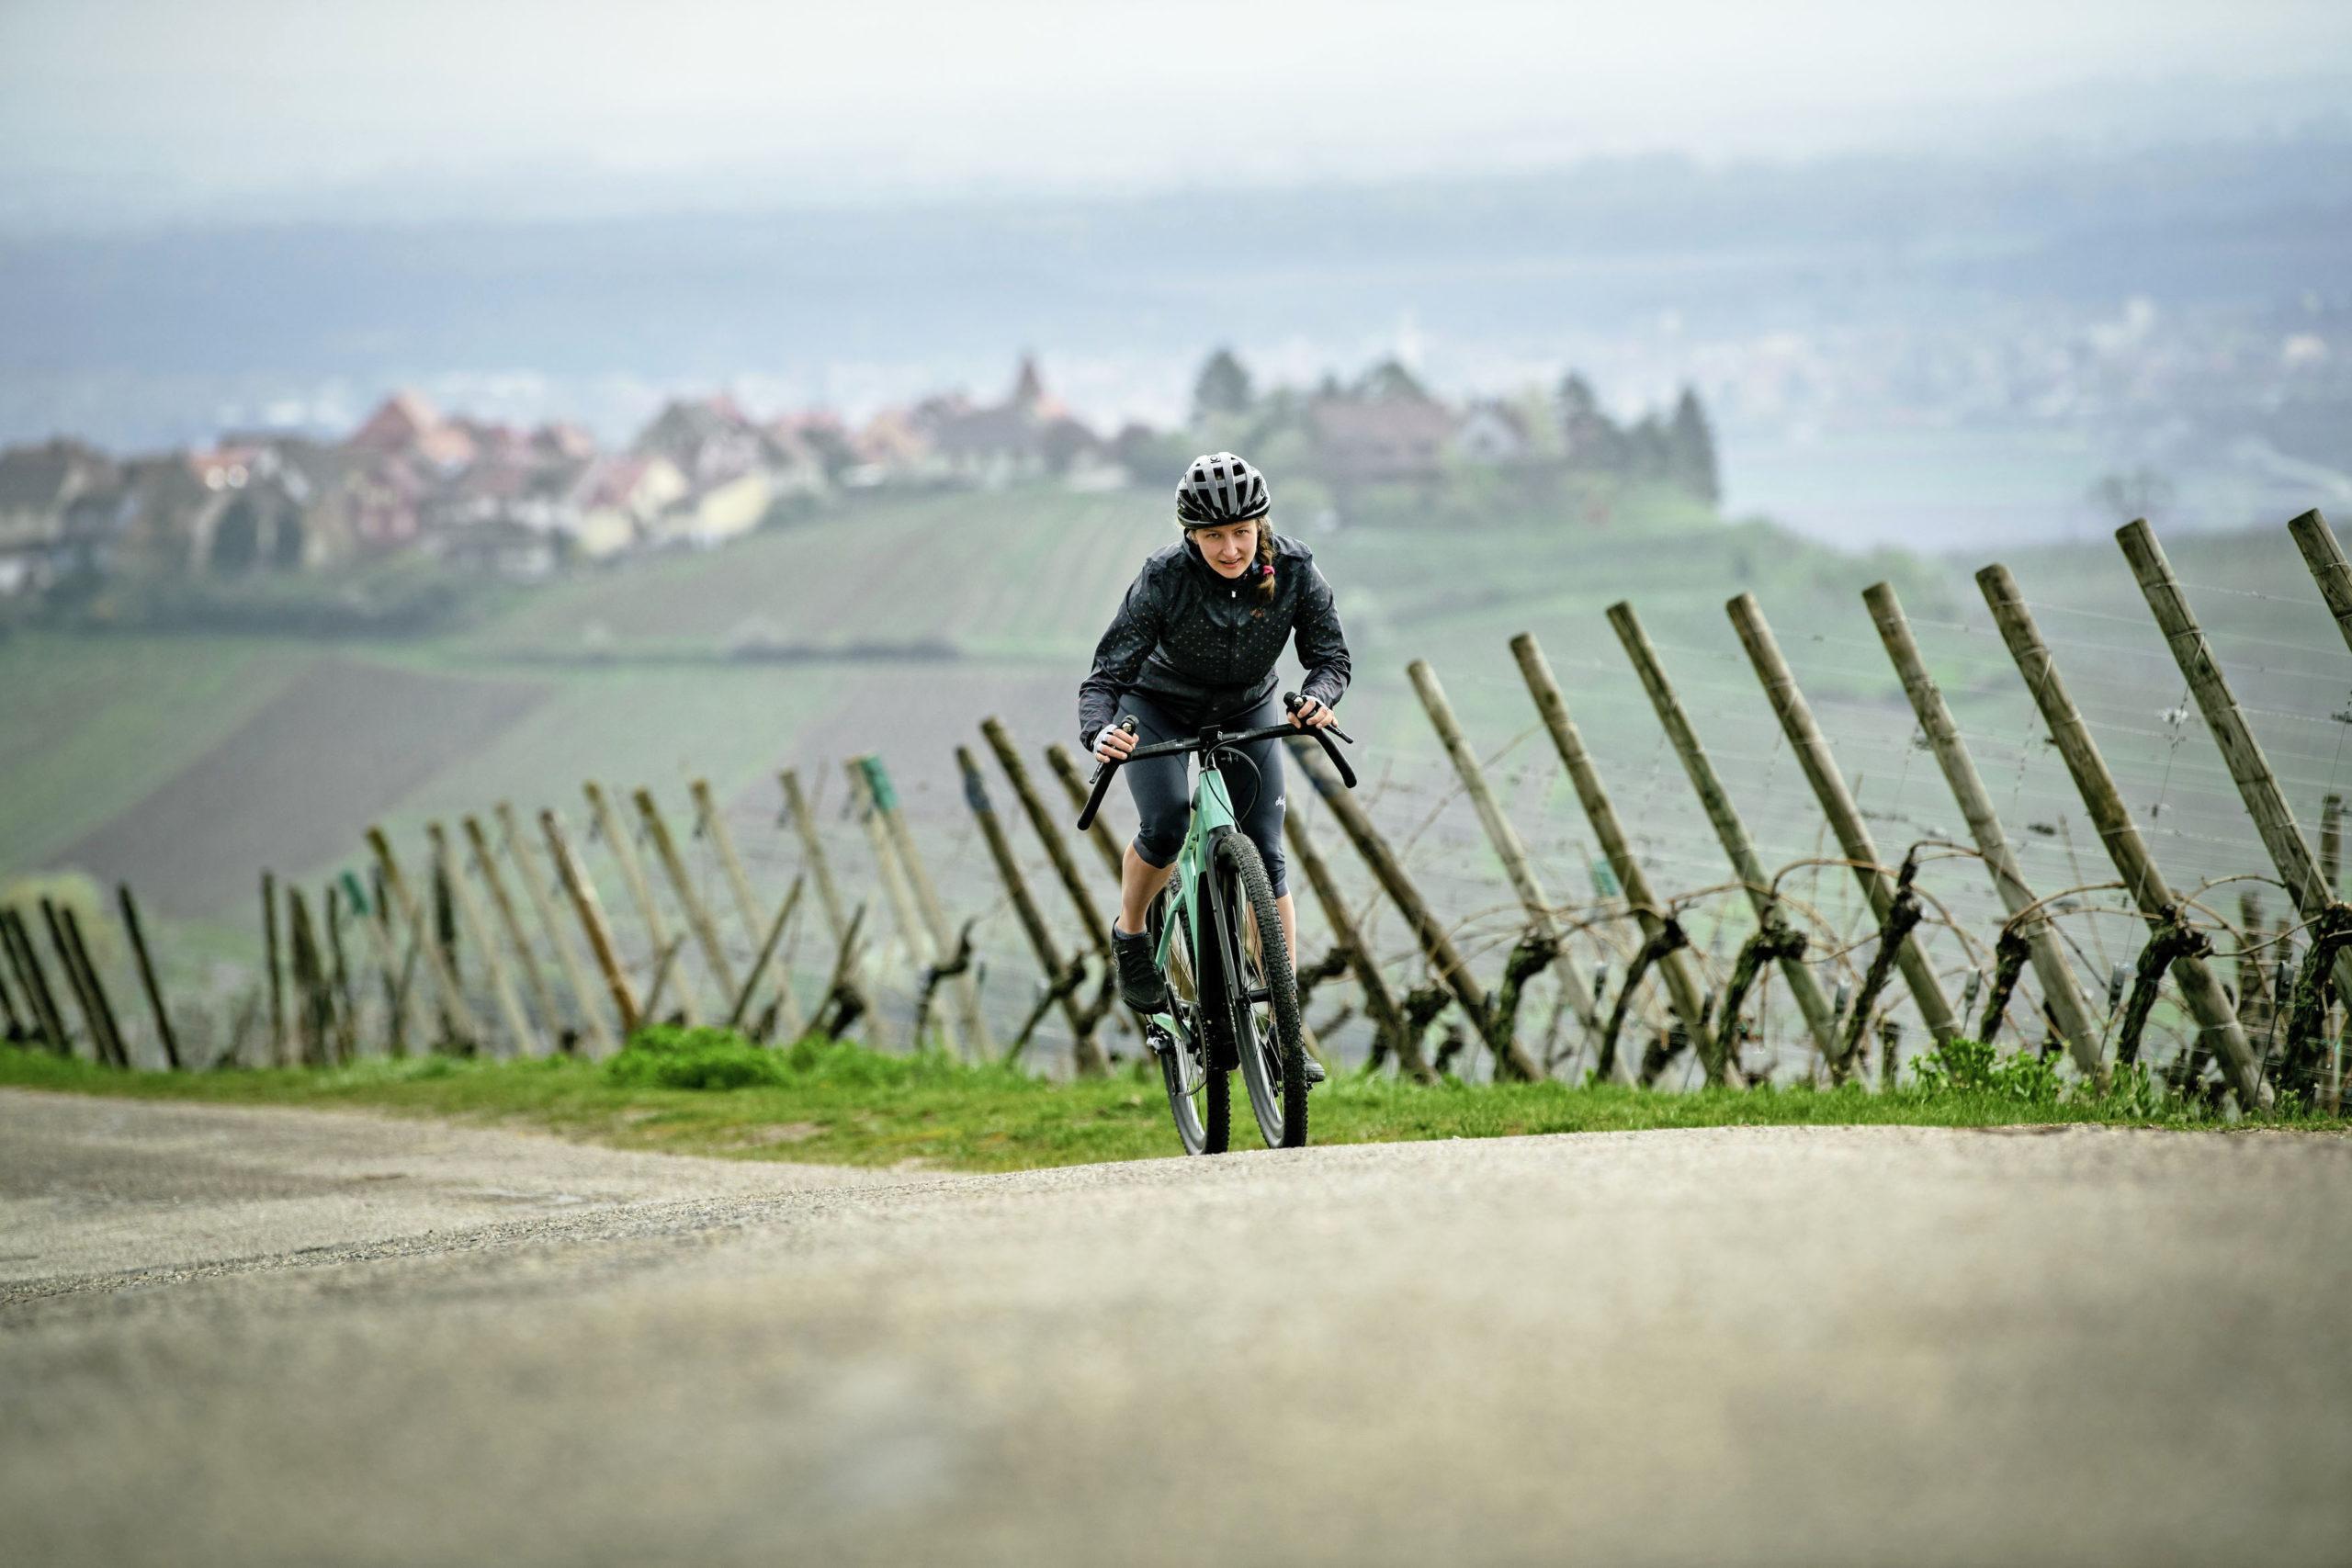 Effektives Work-out mit dem E-Bike